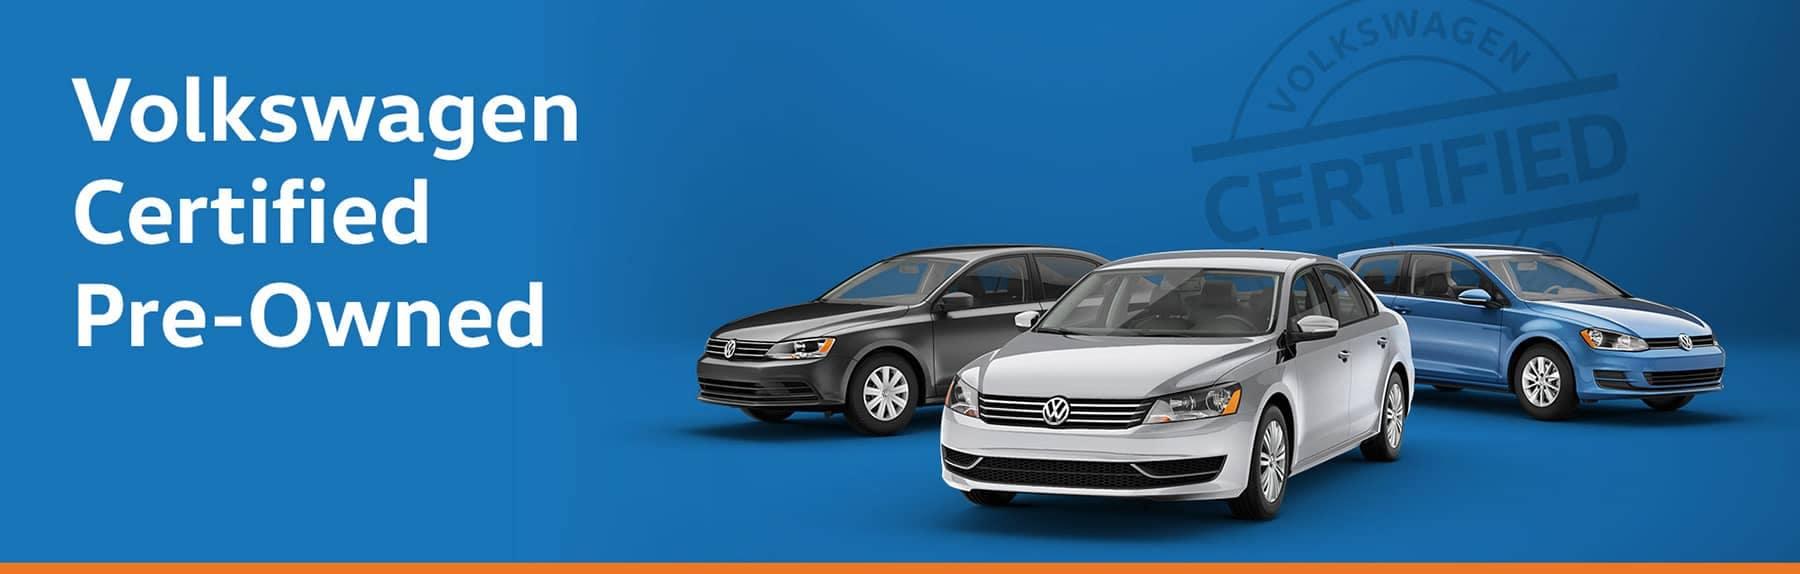 Volkswagen Certified Pre Owned Program Haselwood Vw Bremerton Wa